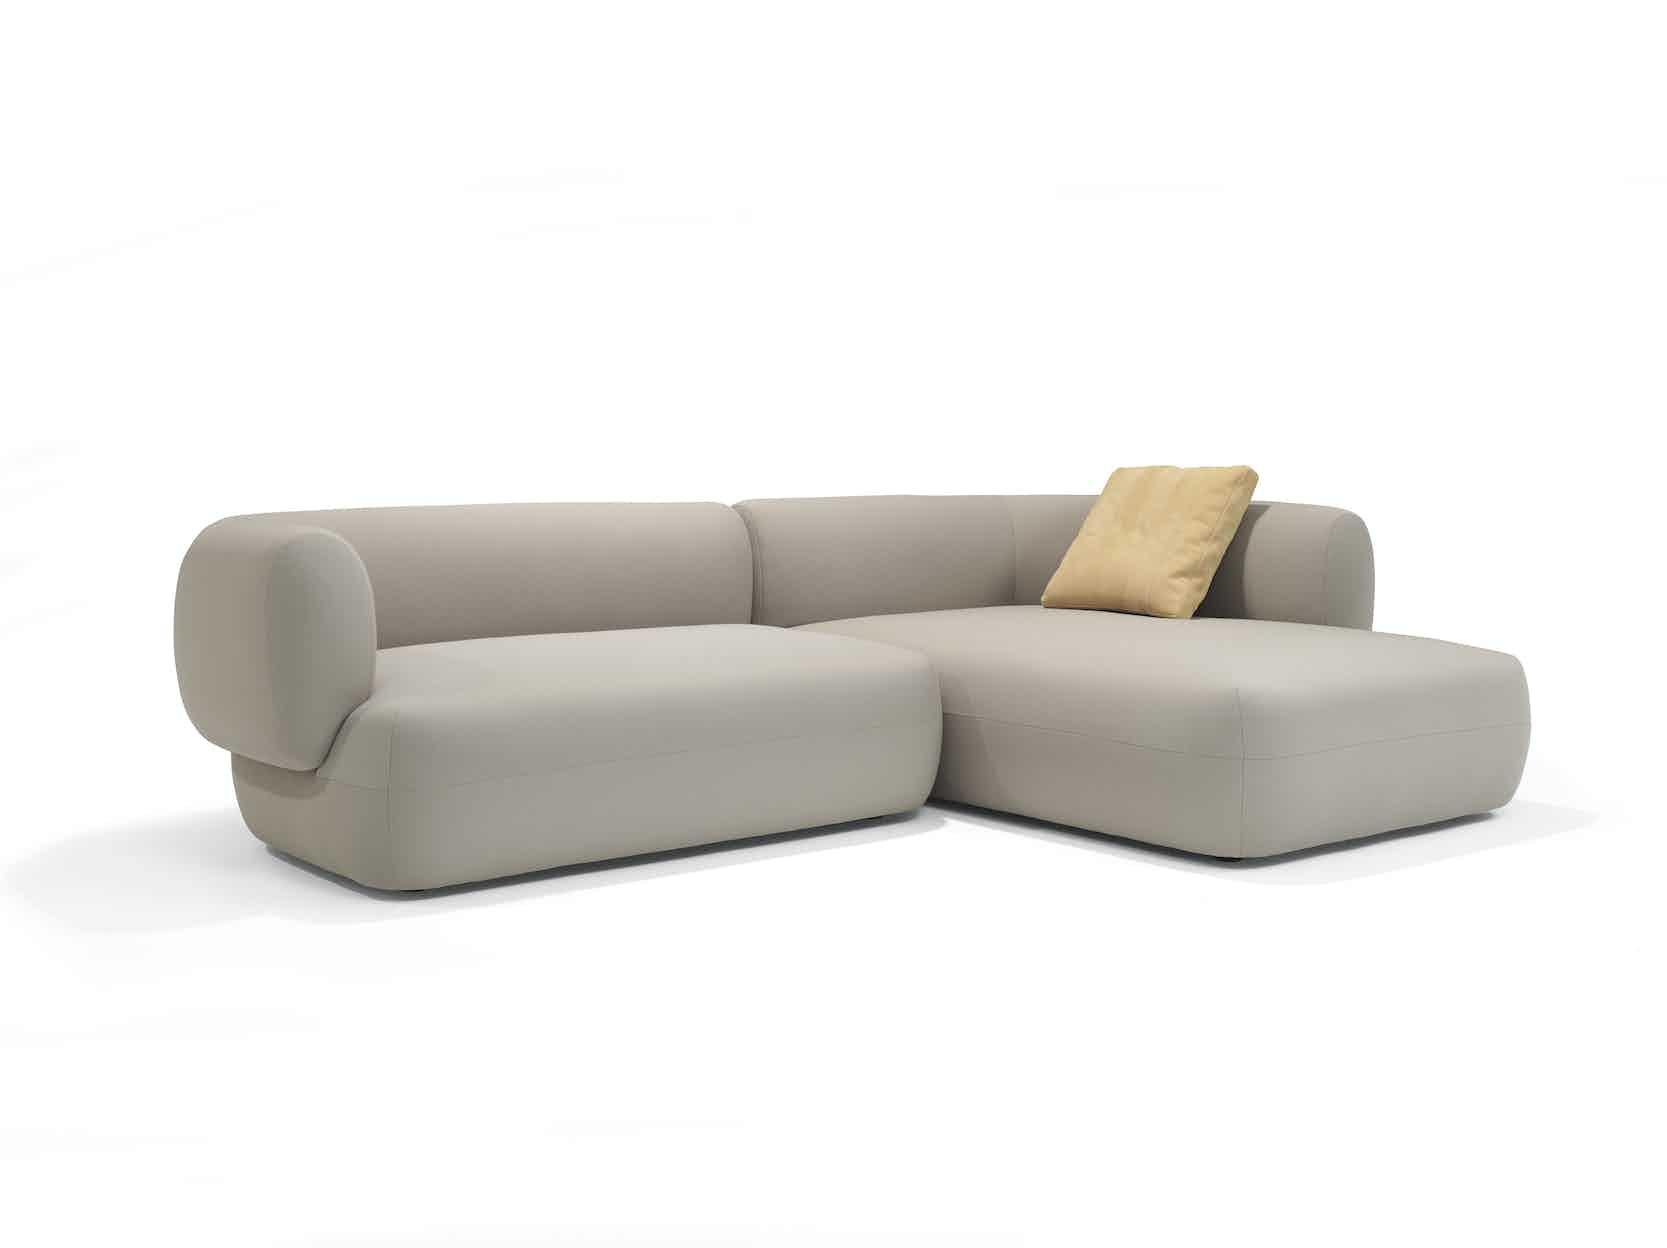 Linteloo-pillow-angle-grey-arp-haute-living